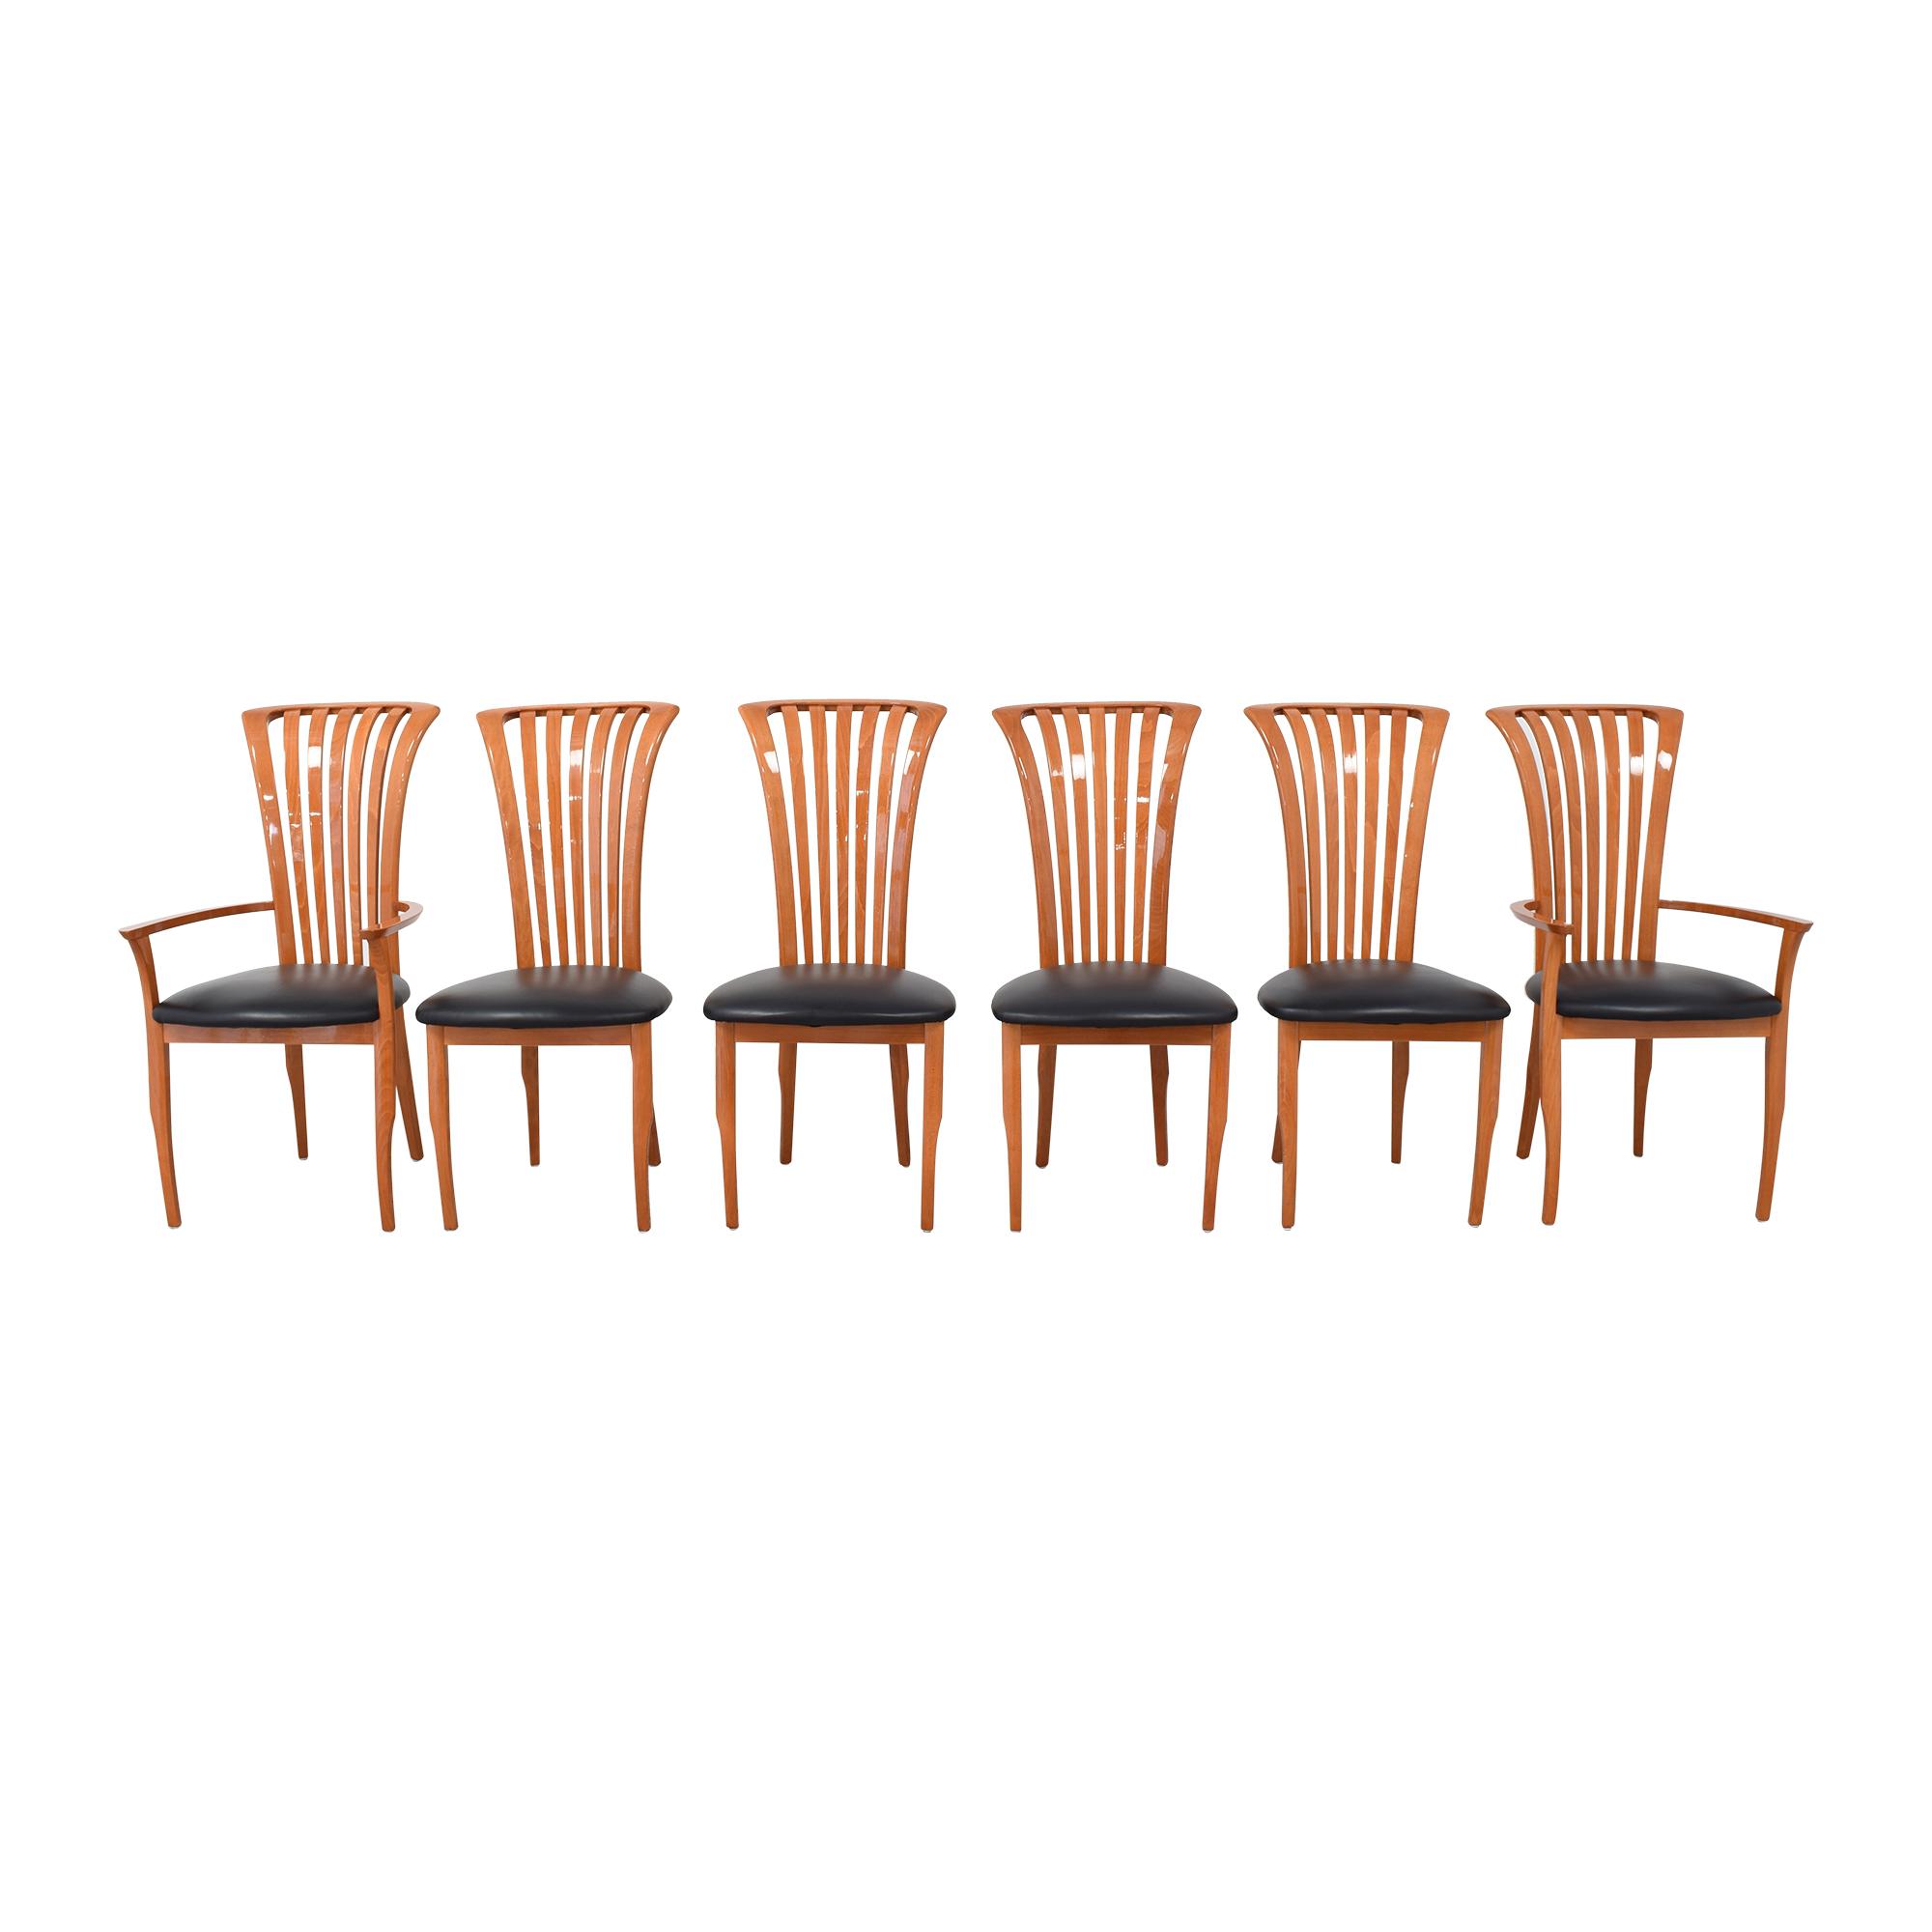 Pietro Costantini Pietro Costantini Modern Dining Chairs